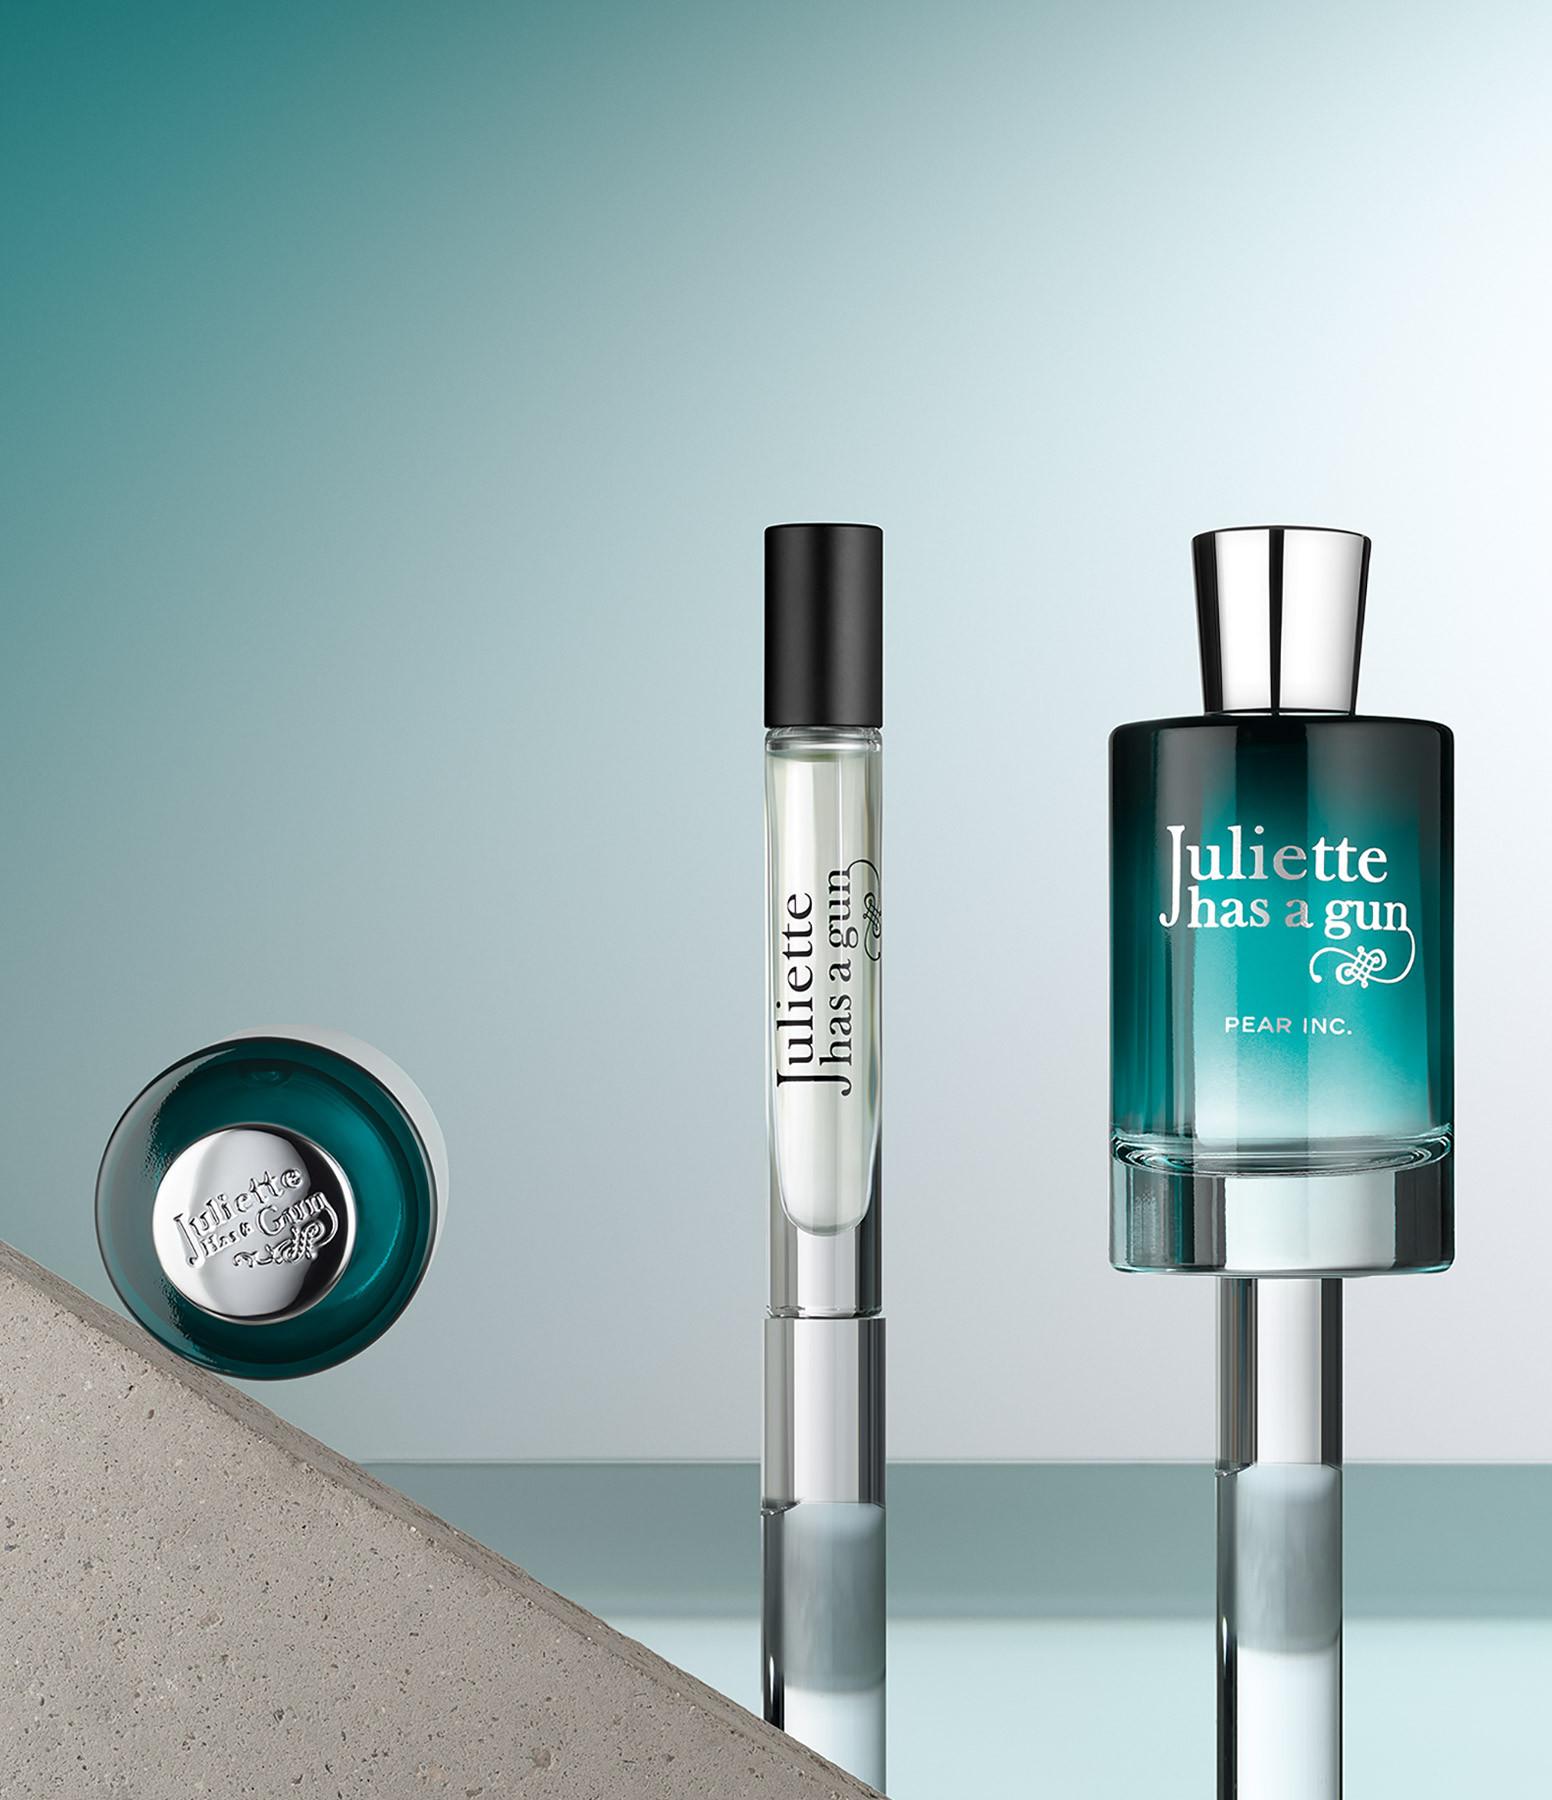 JULIETTE HAS A GUN - Eau de parfum Pear Inc 100 ml